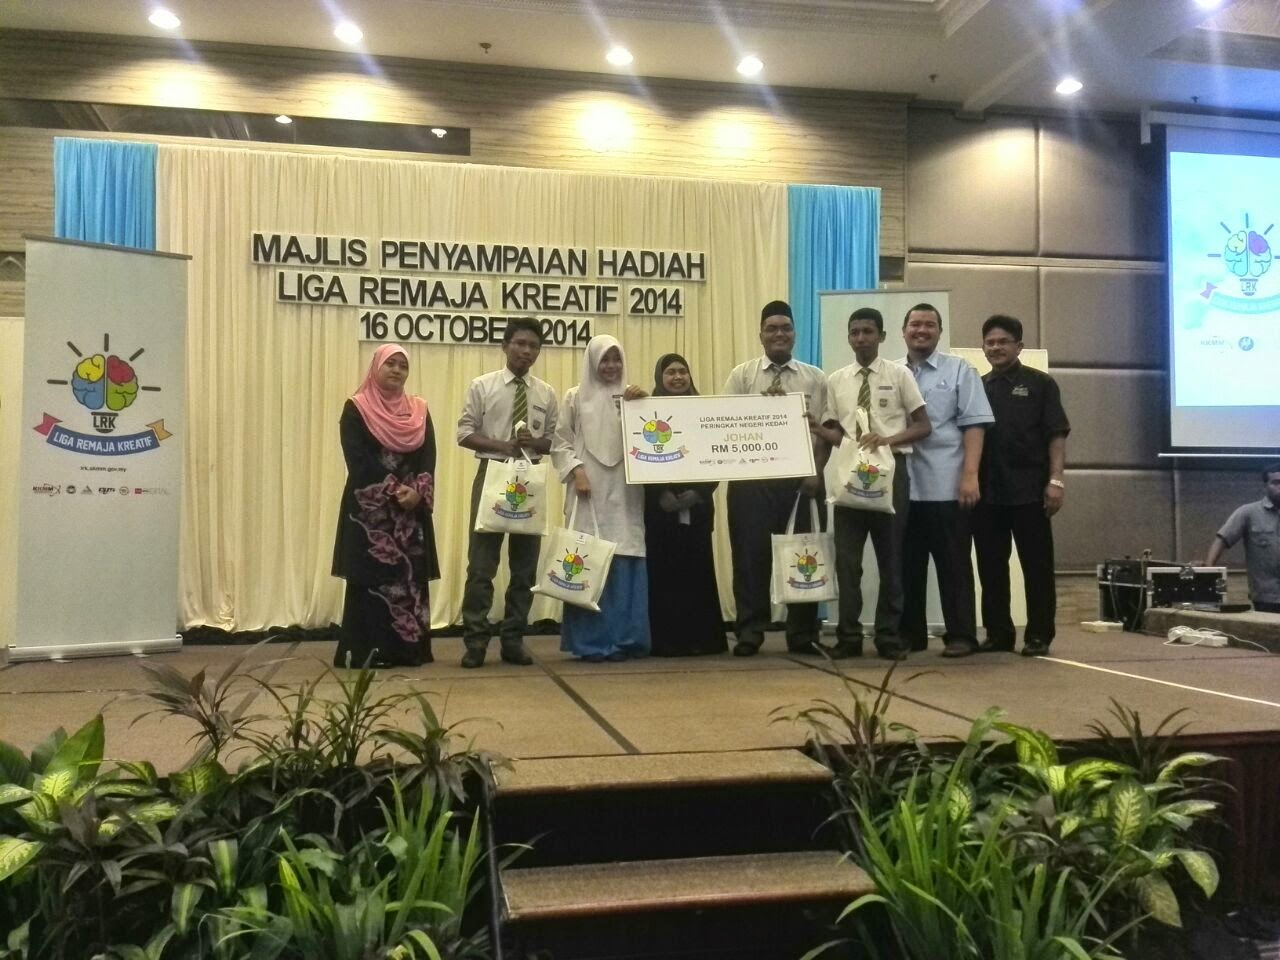 Keputusan Liga Remaja Kreatif 2014 (Zon Utara) Kedah